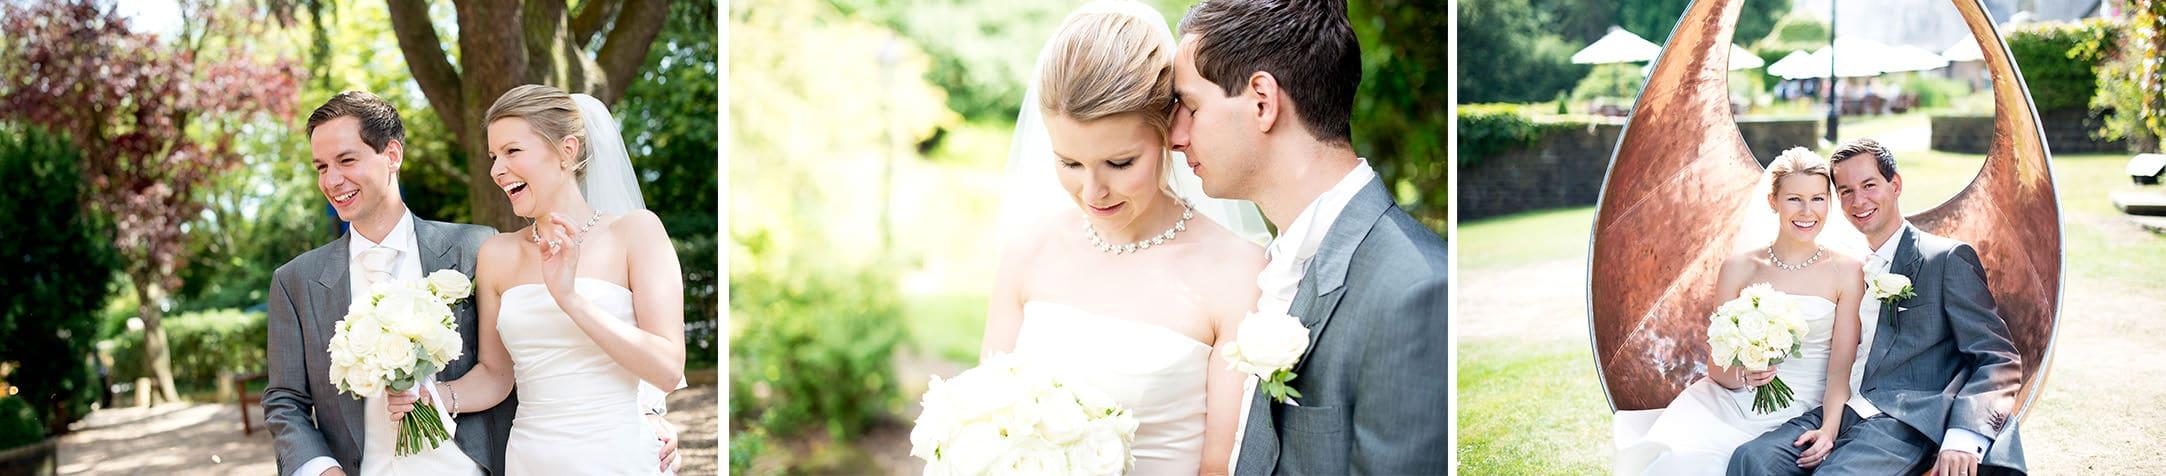 Penny Hill Park Wedding